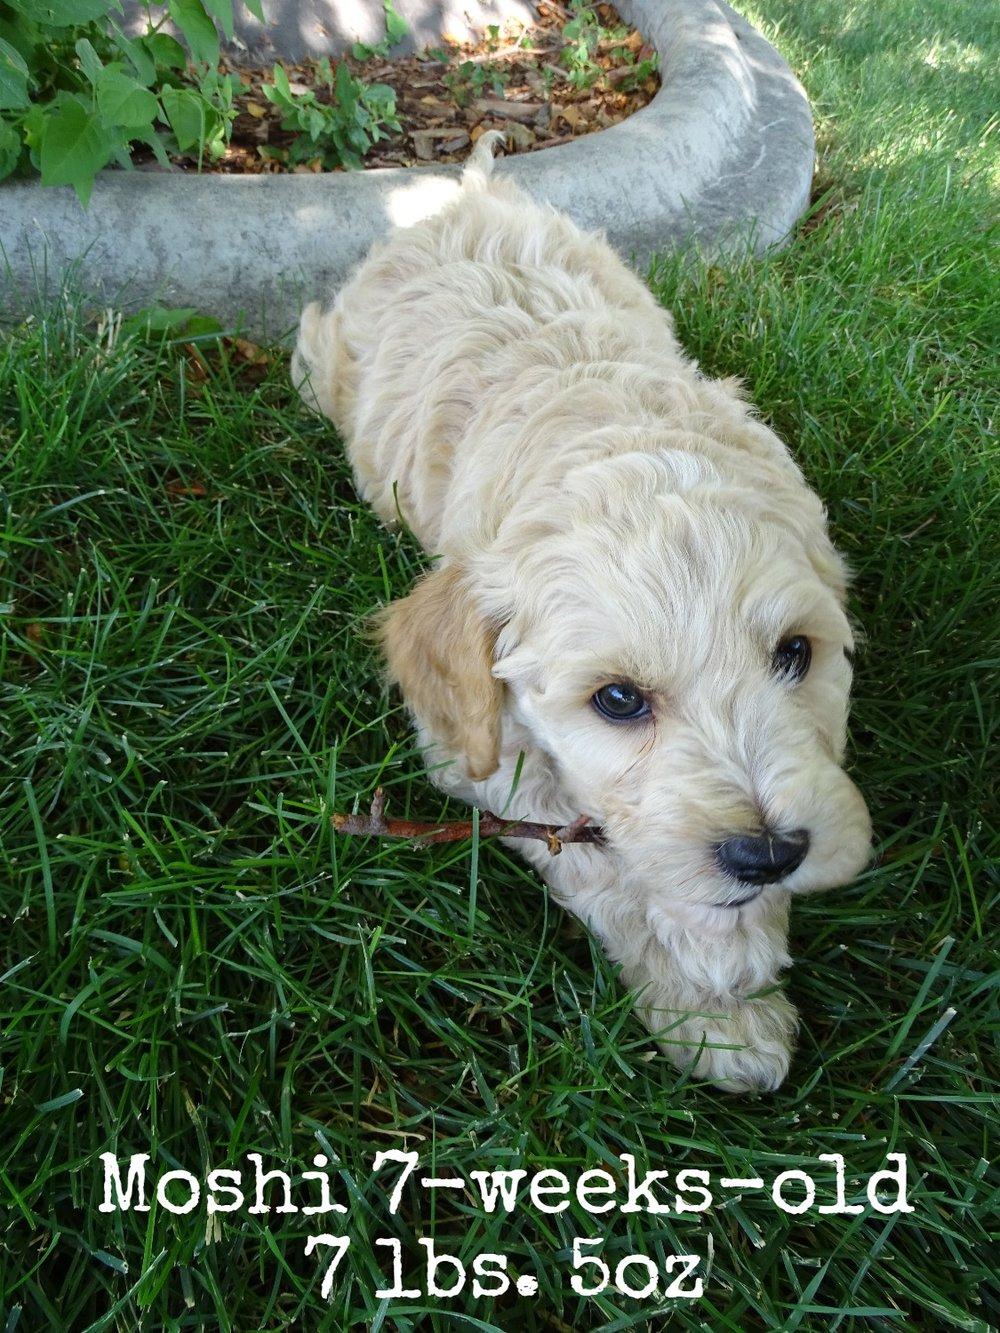 Moshi_7 weeks old_3.jpg